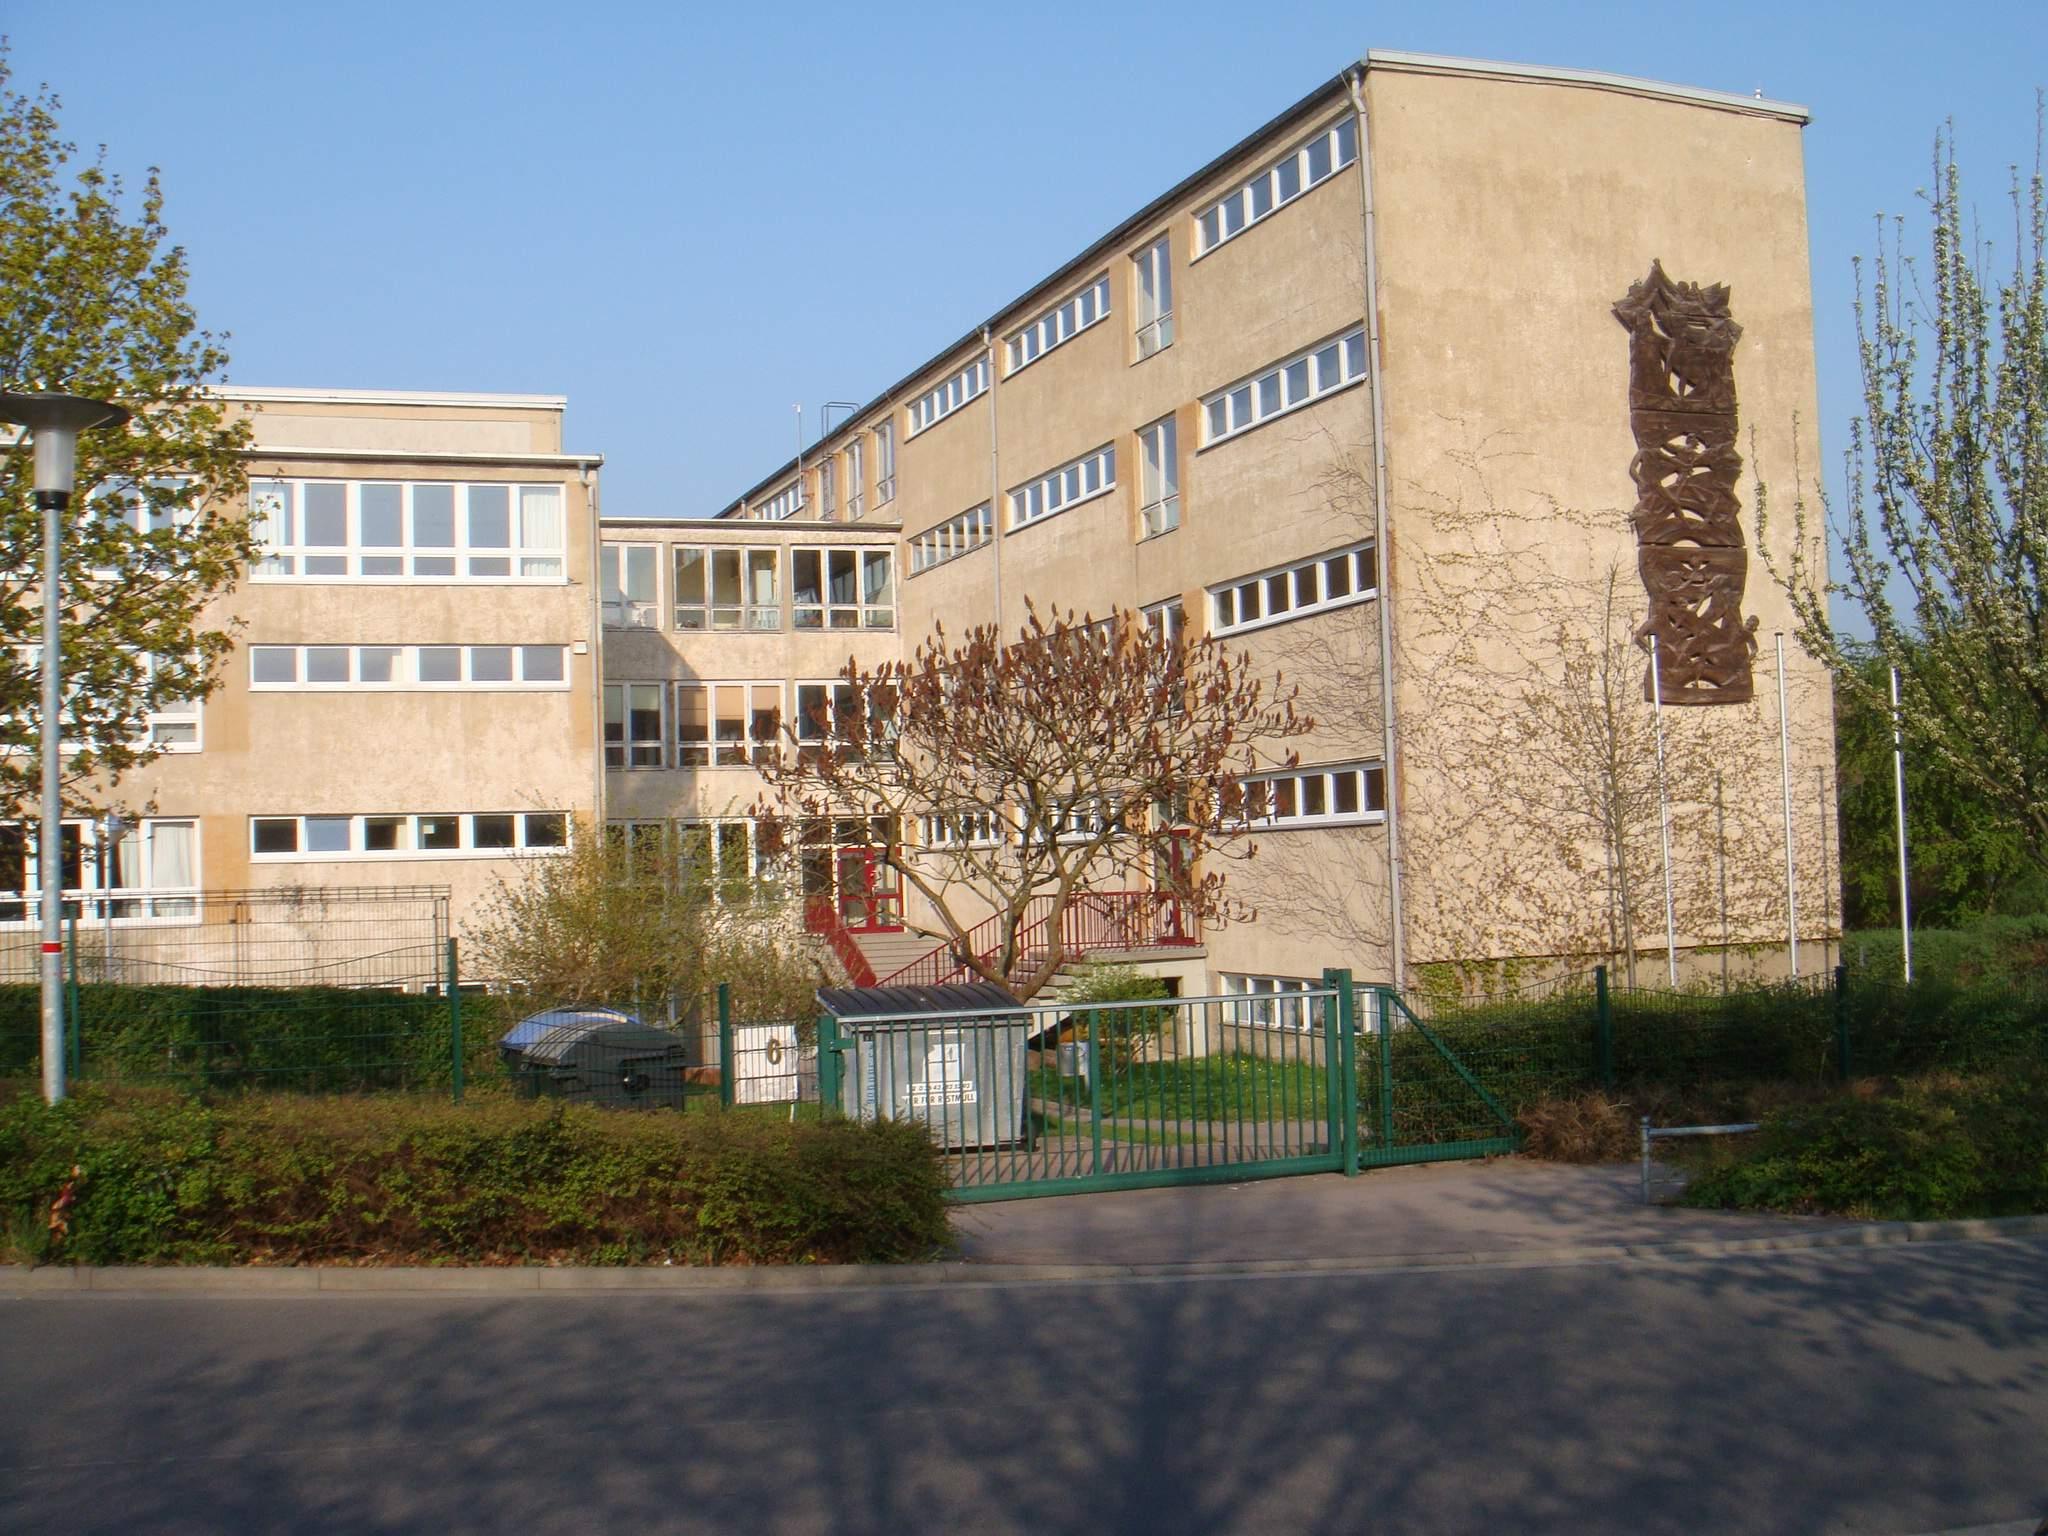 Werner Seelenbinder Schule Apolda 1 JPG